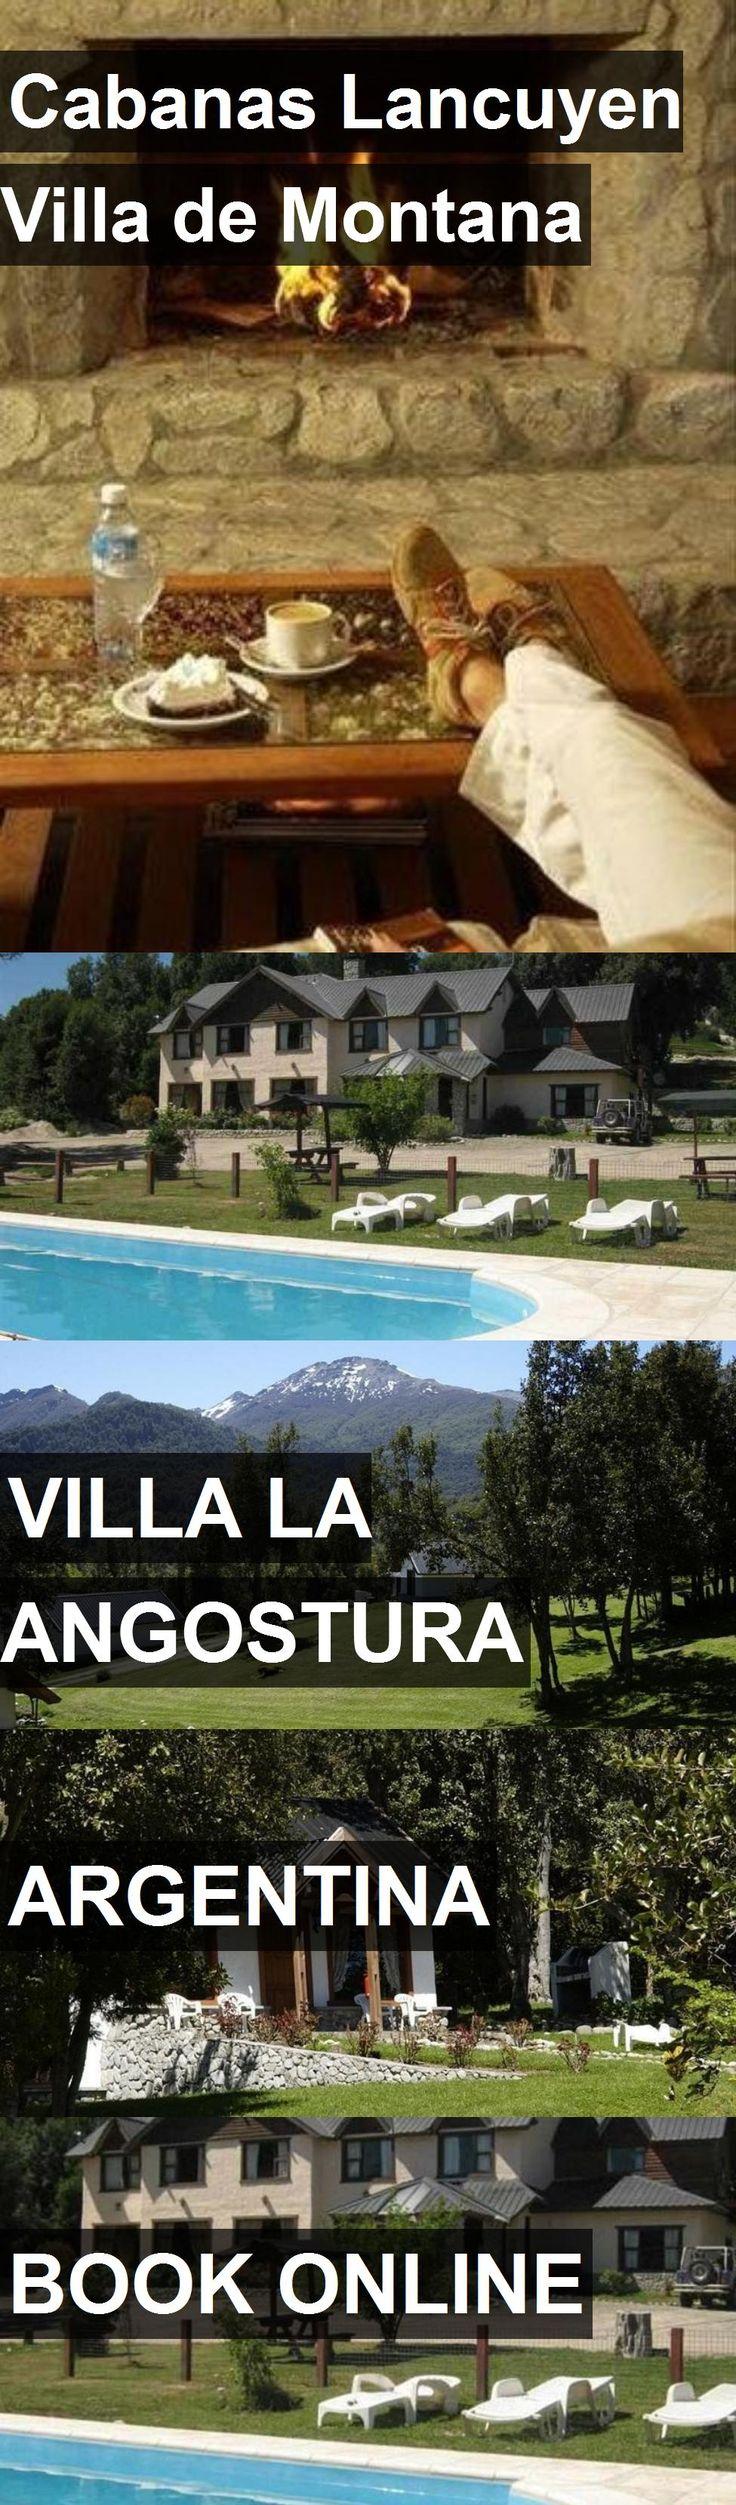 Hotel Cabanas Lancuyen Villa de Montana in Villa la Angostura, Argentina. For more information, photos, reviews and best prices please follow the link. #Argentina #VillalaAngostura #travel #vacation #hotel